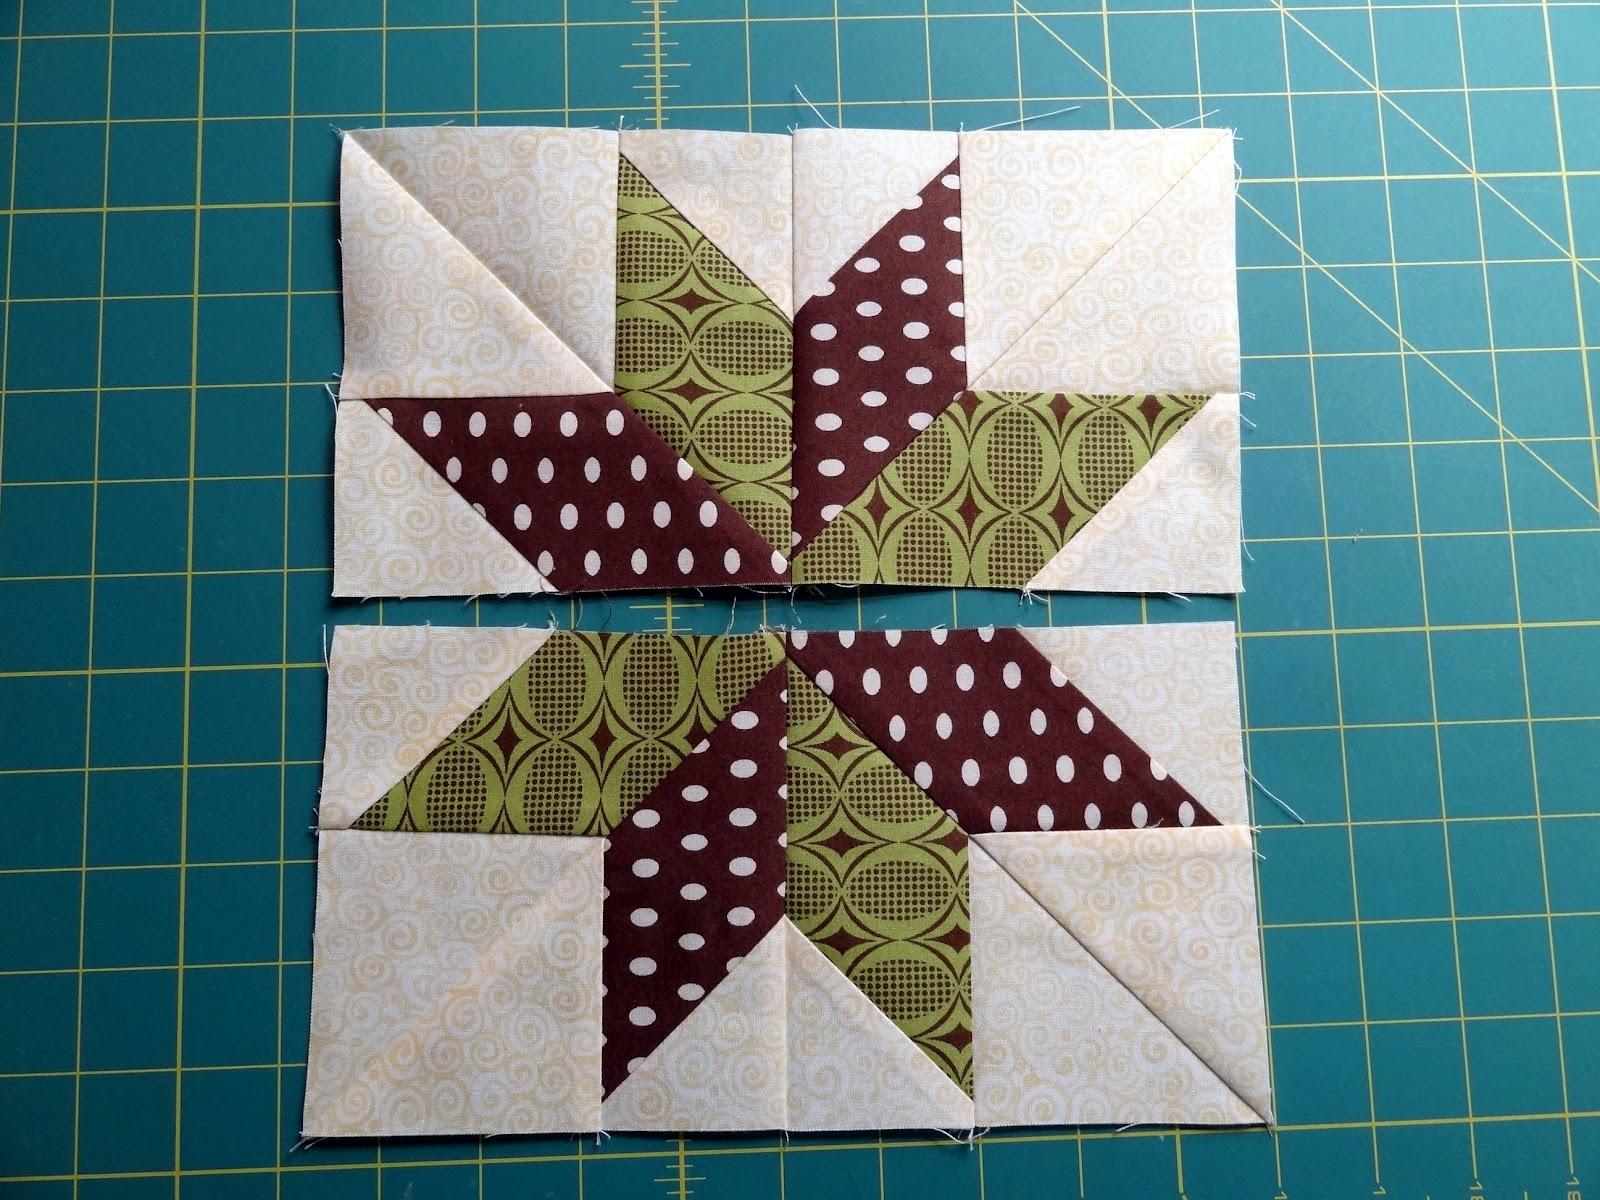 Squash House Quilts: No Y-Seams 8-Point Star Tutorial! : star pattern quilt - Adamdwight.com